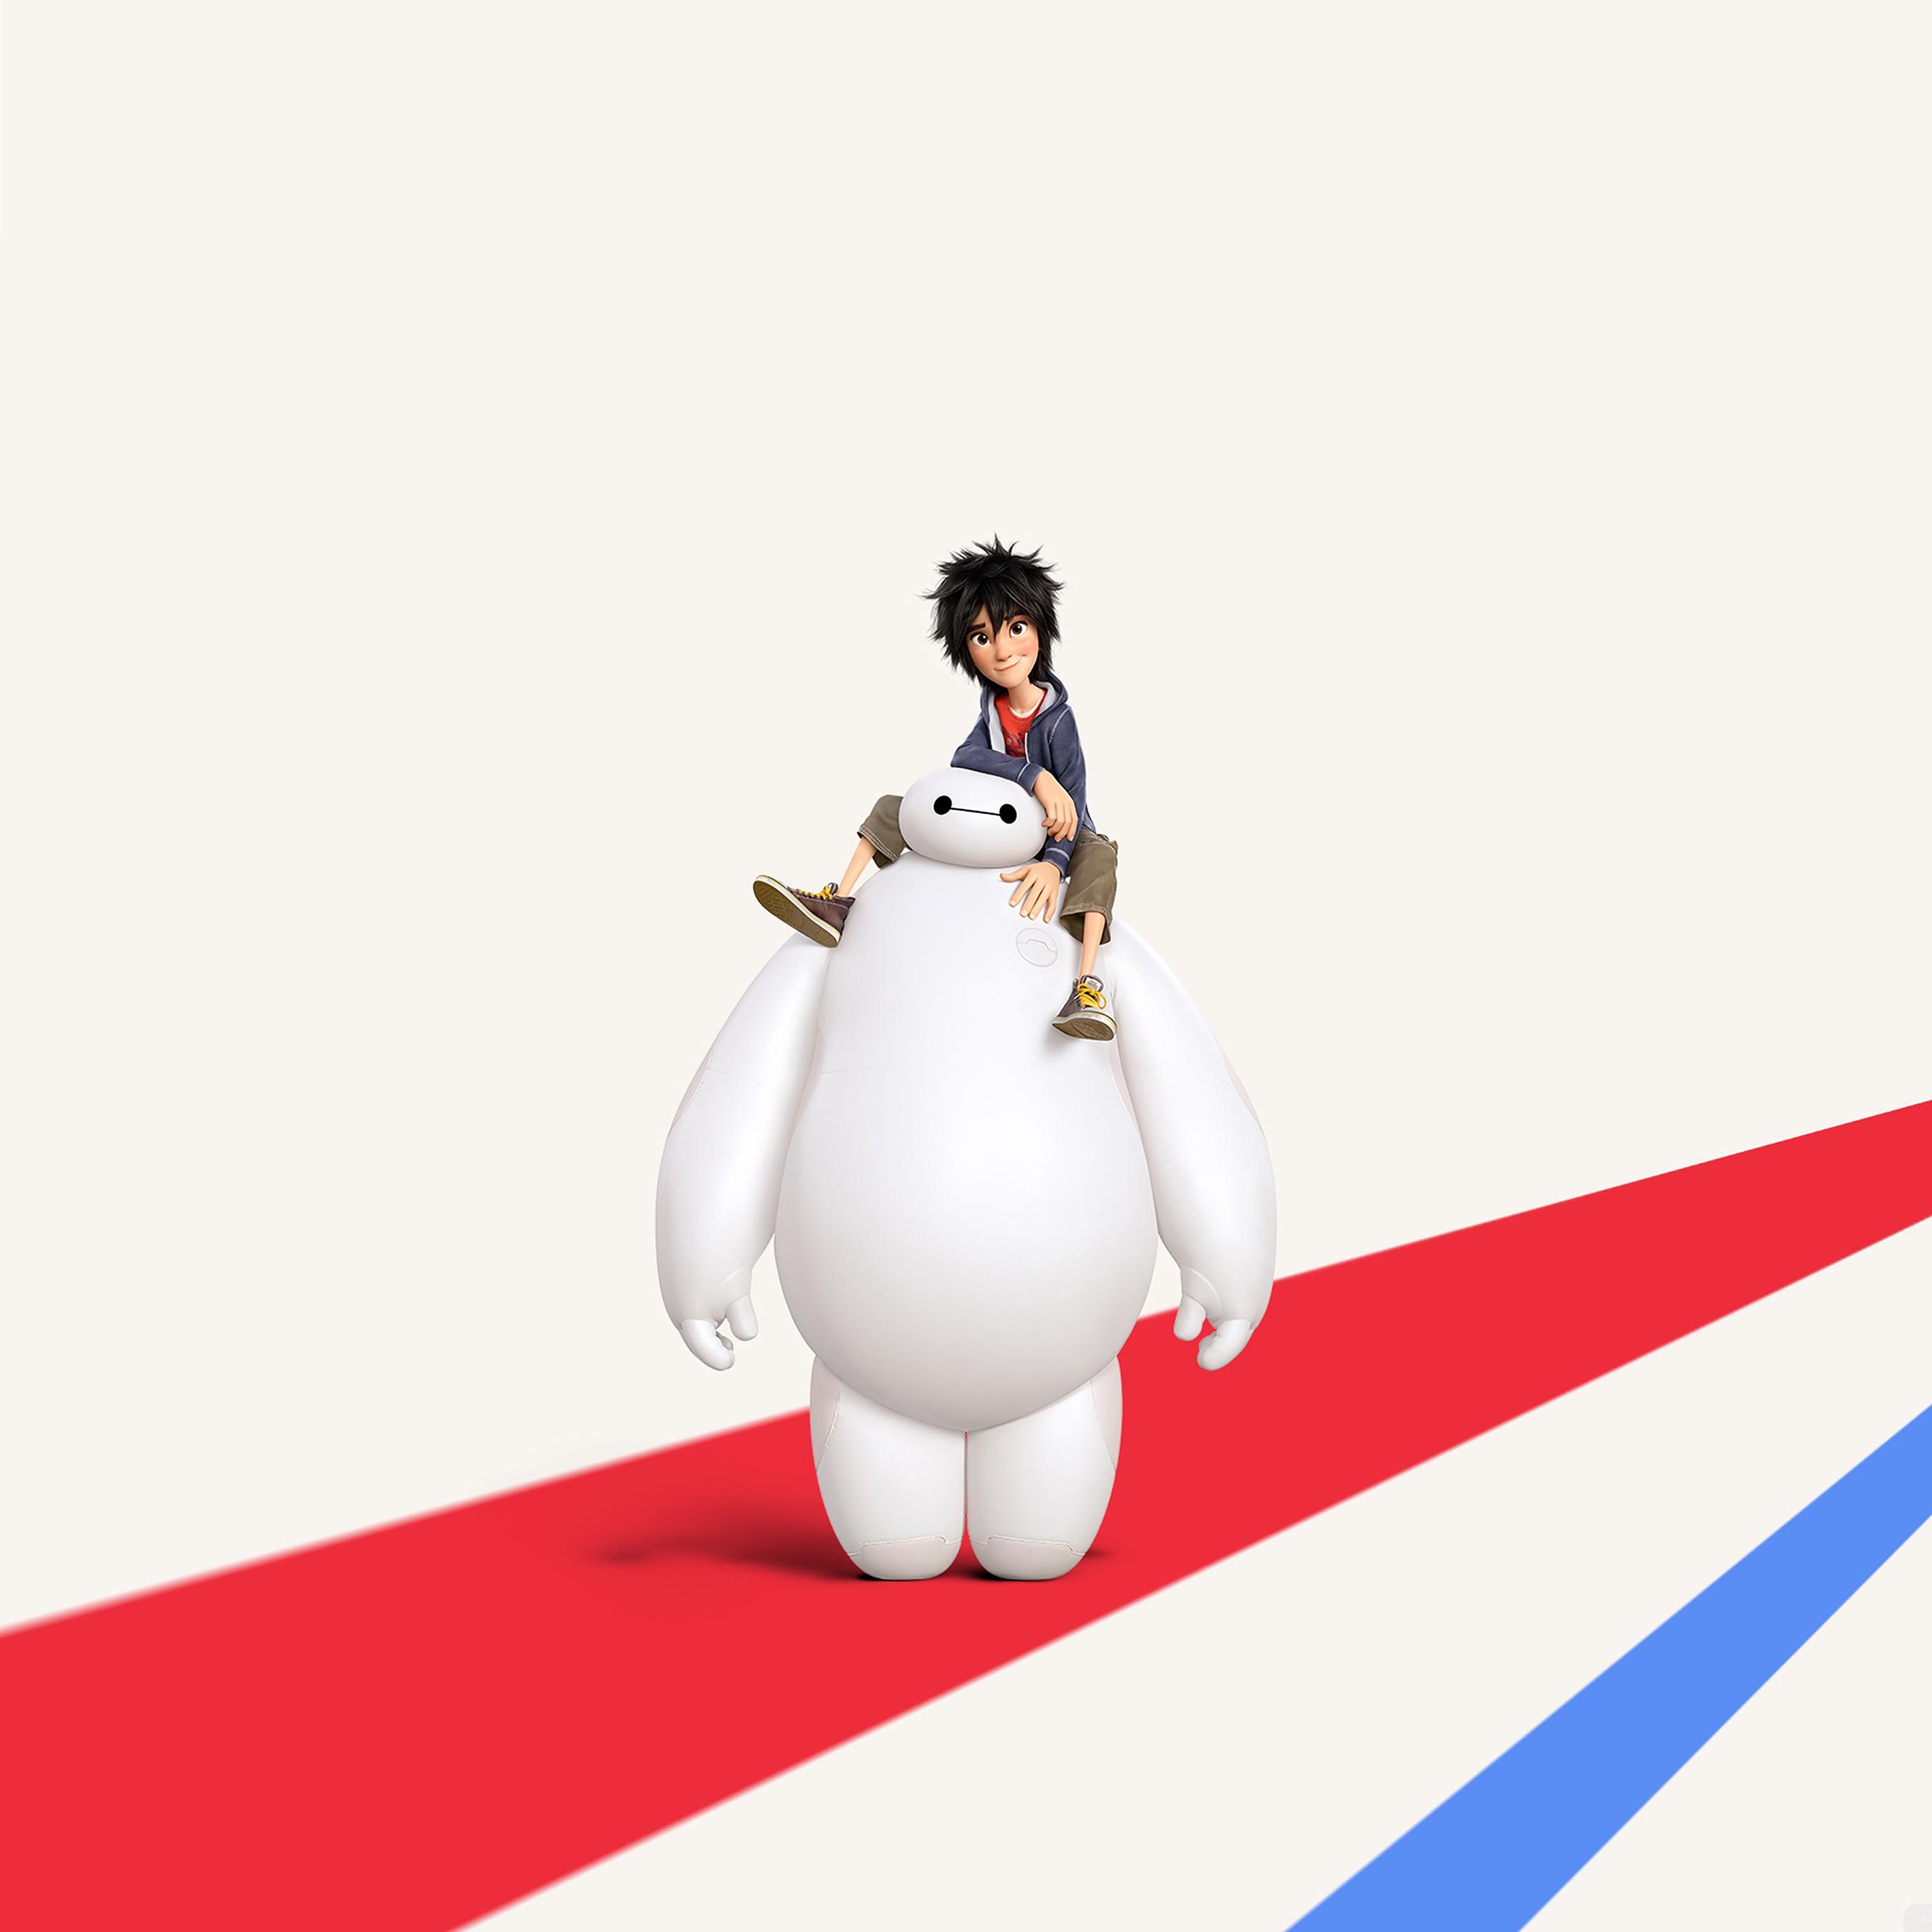 big hero 6 android wallpaper: Af93-big-hero-6-cute